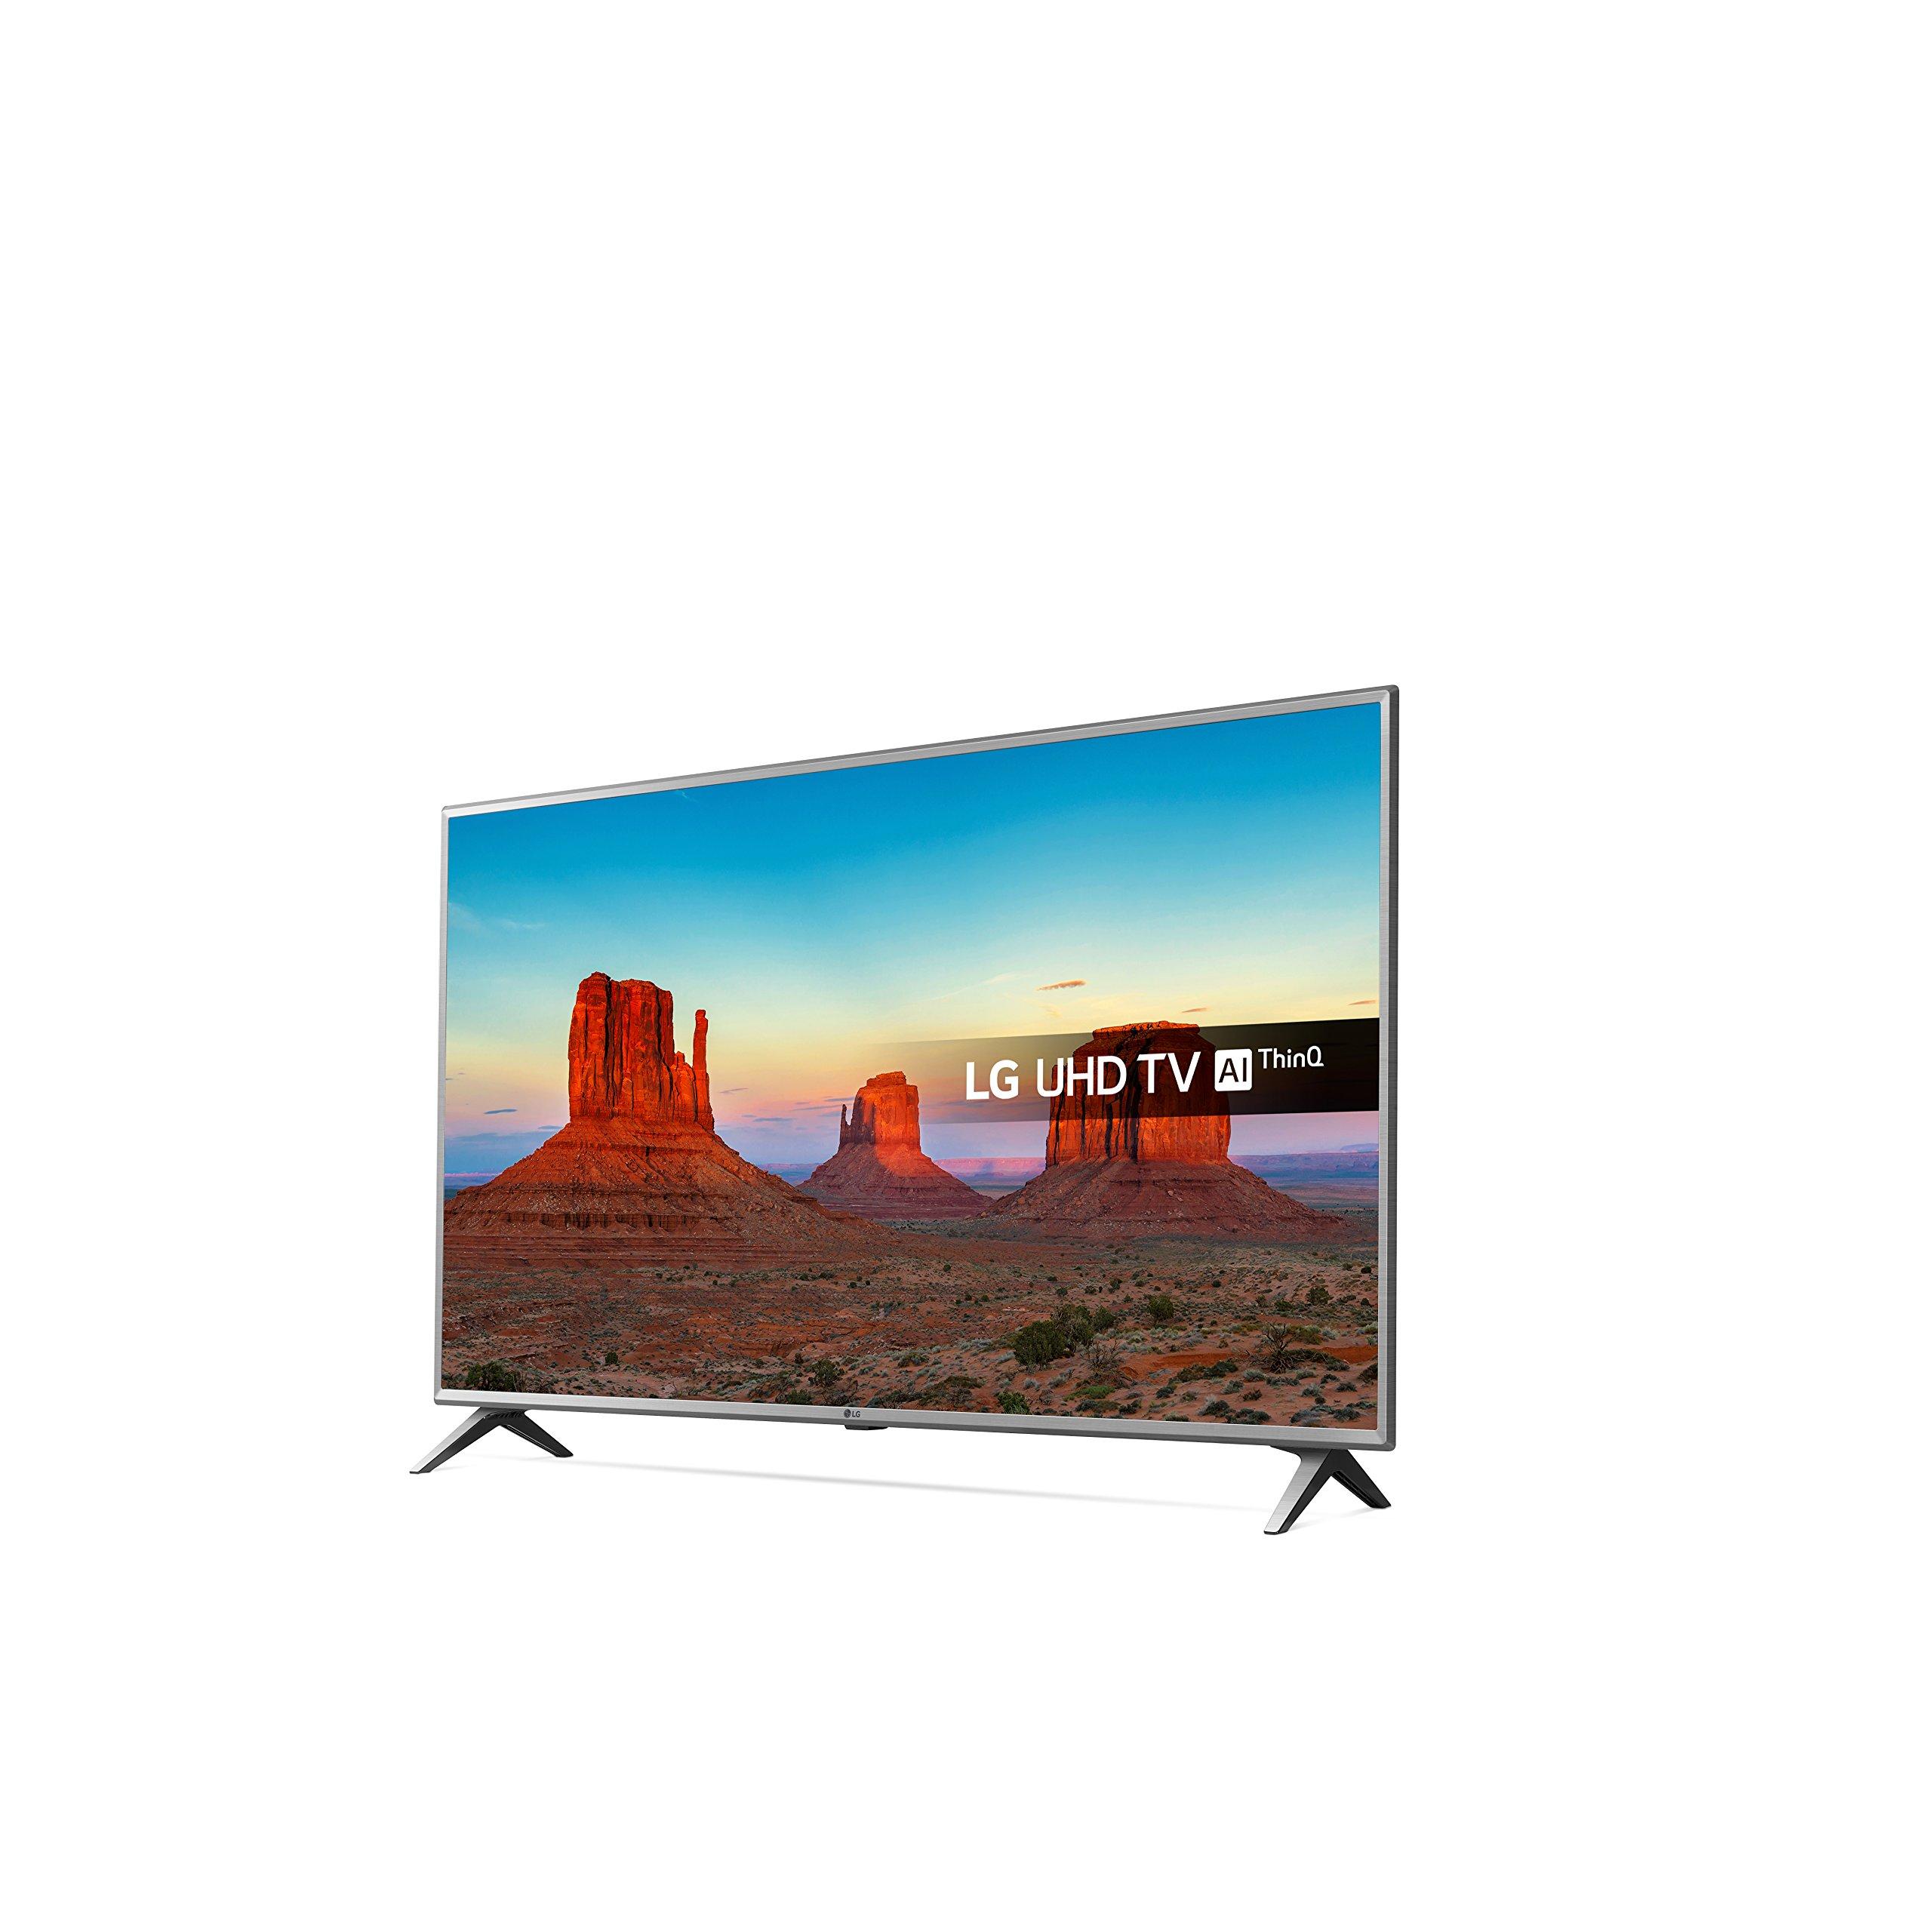 TV 65 LED LG 65UK6500PLA 4K UHD 3840*2160 IPS SMARTTV 4HDMI 2USB IA GOOGLE ASSIST: BLOCK: Amazon.es: Electrónica